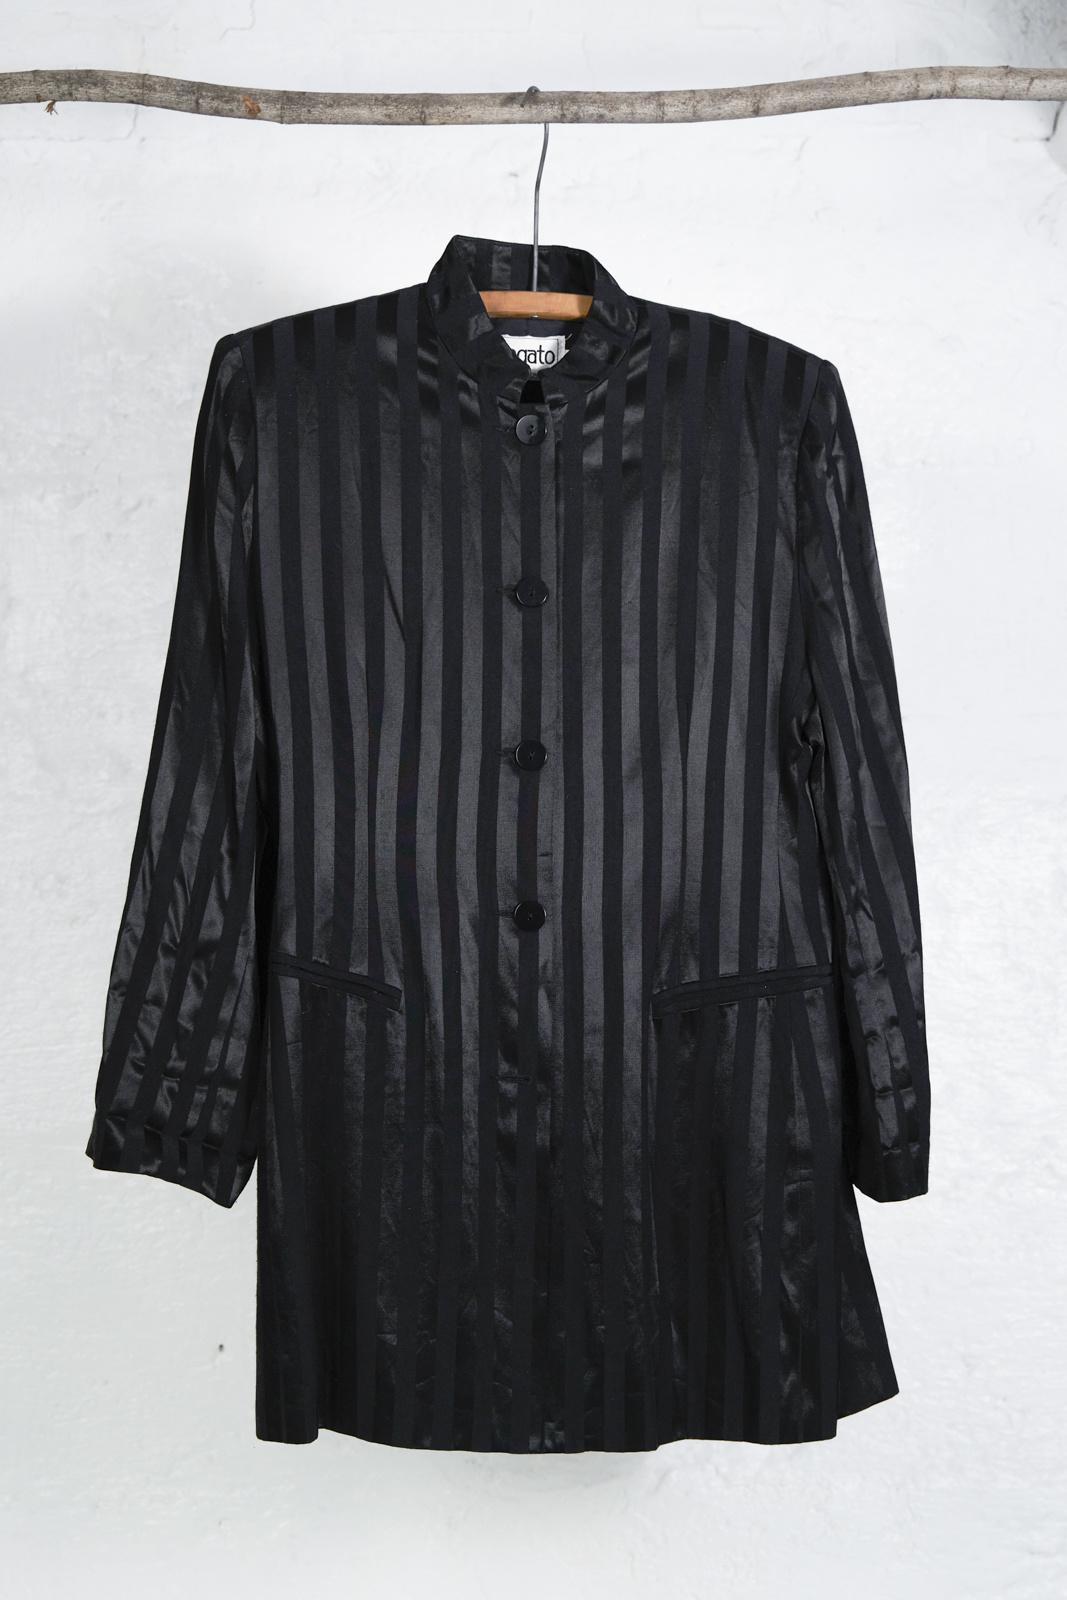 Long Black Tone on Tone Striped Blazer